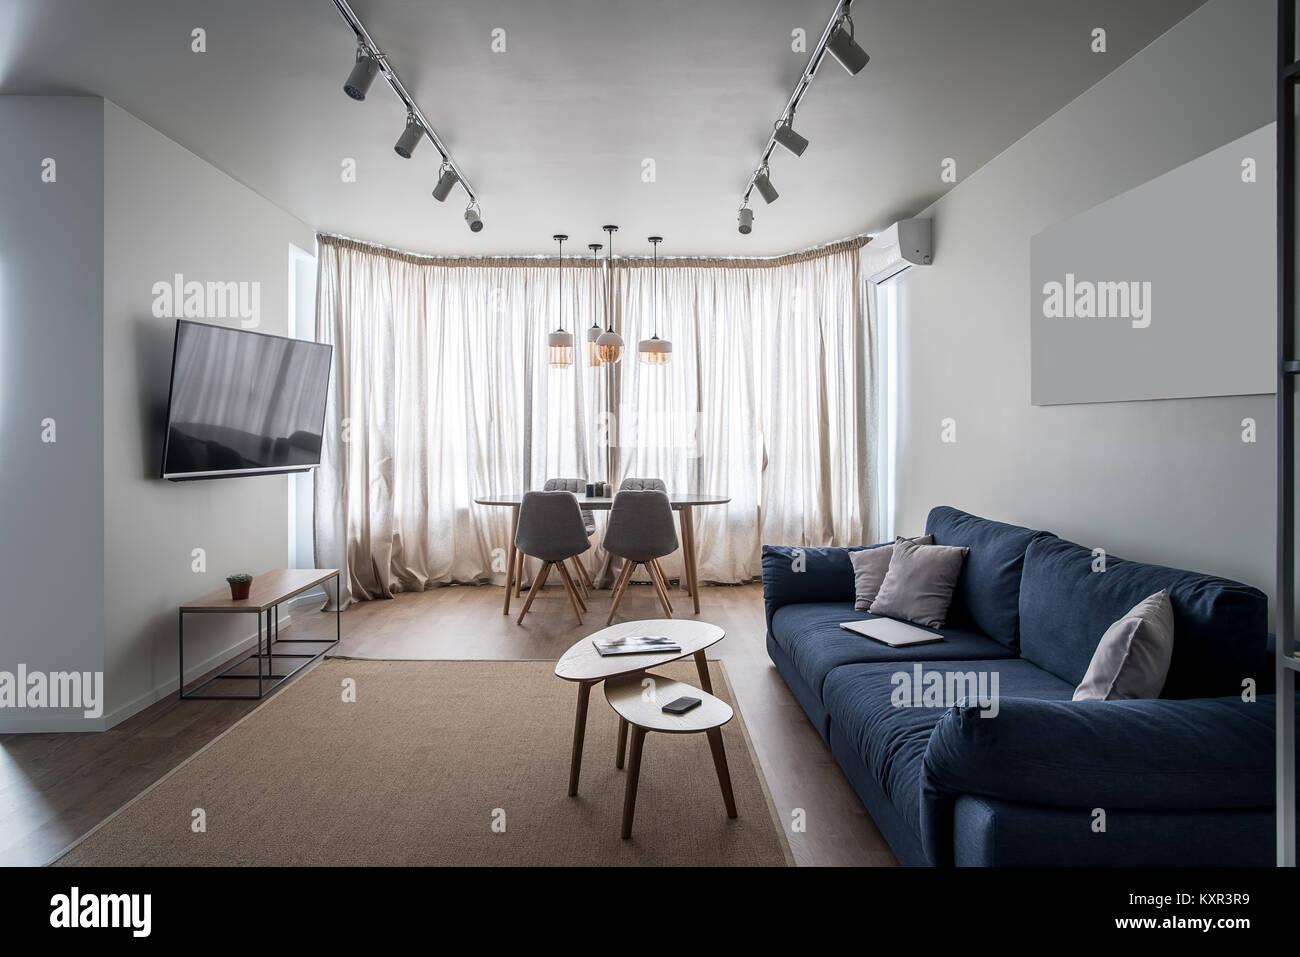 Arredamento Moderno Elegante : Dressy mobili eleganti per arredo bagno moderno ideagroup